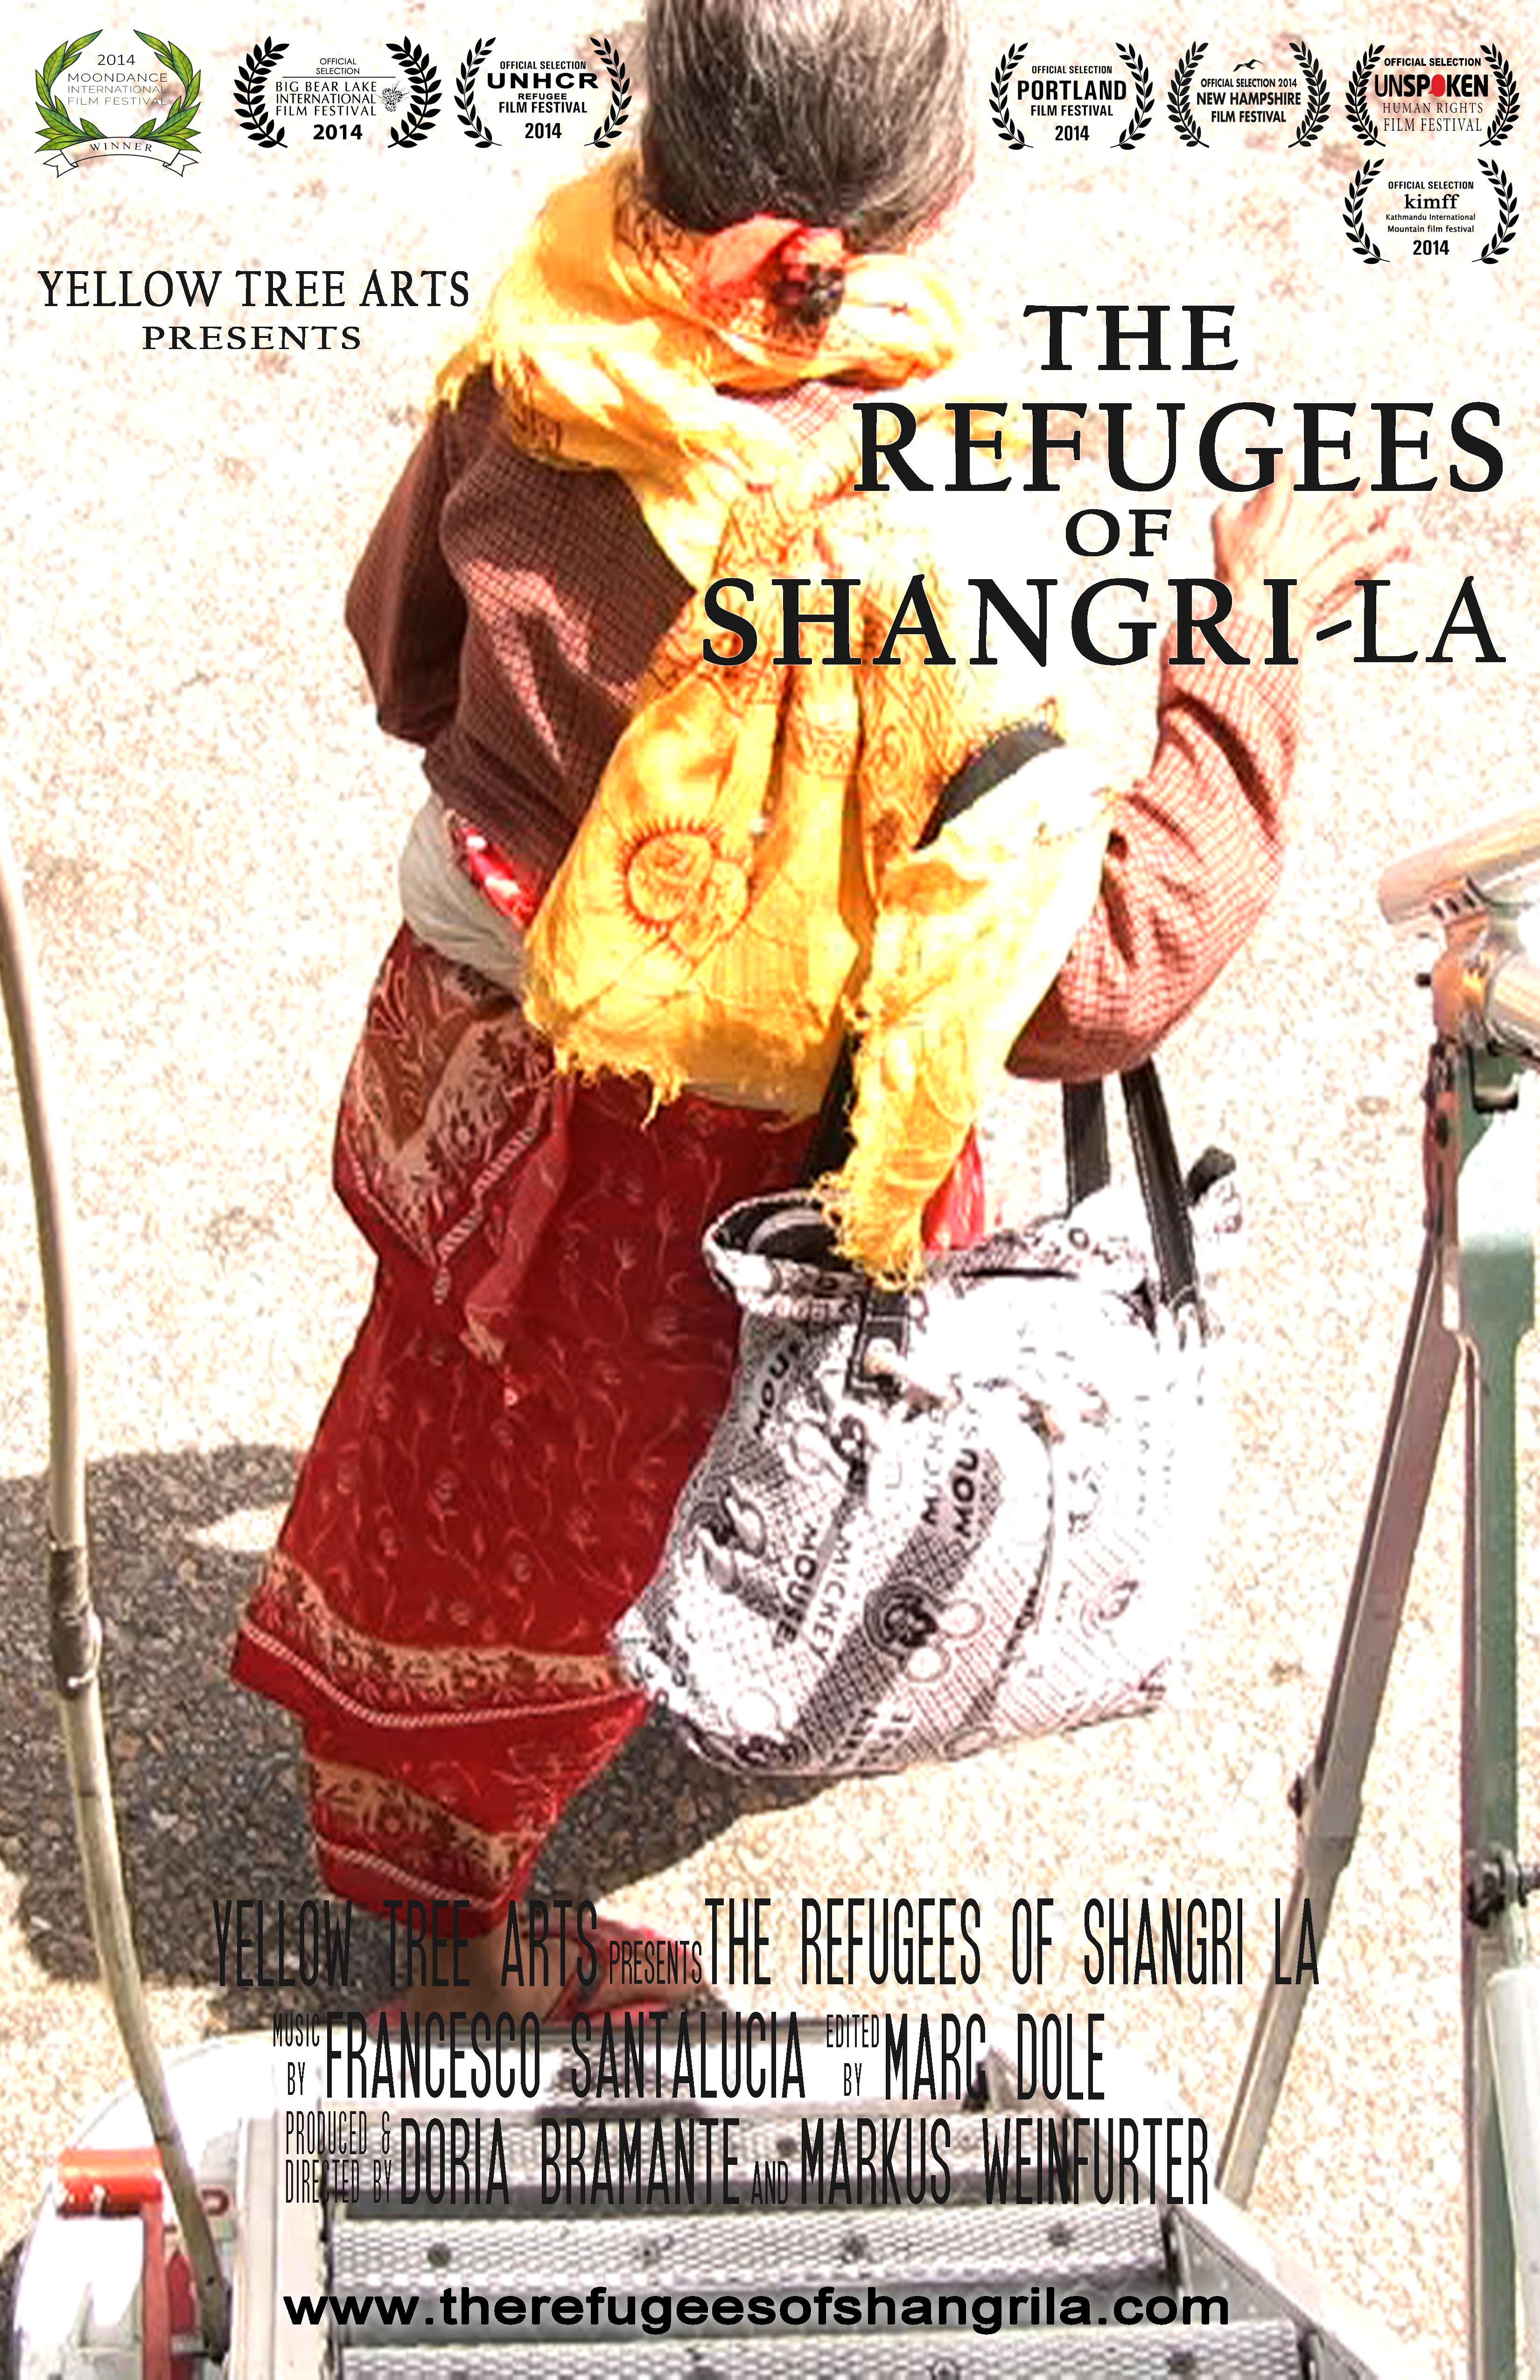 TheRefugeesofShangriLa_poster-2